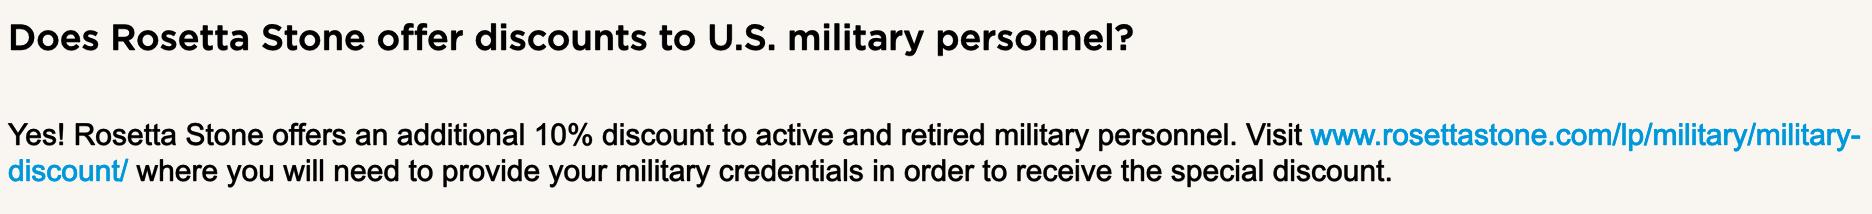 Rosetta Stone Military Veteran Discounts